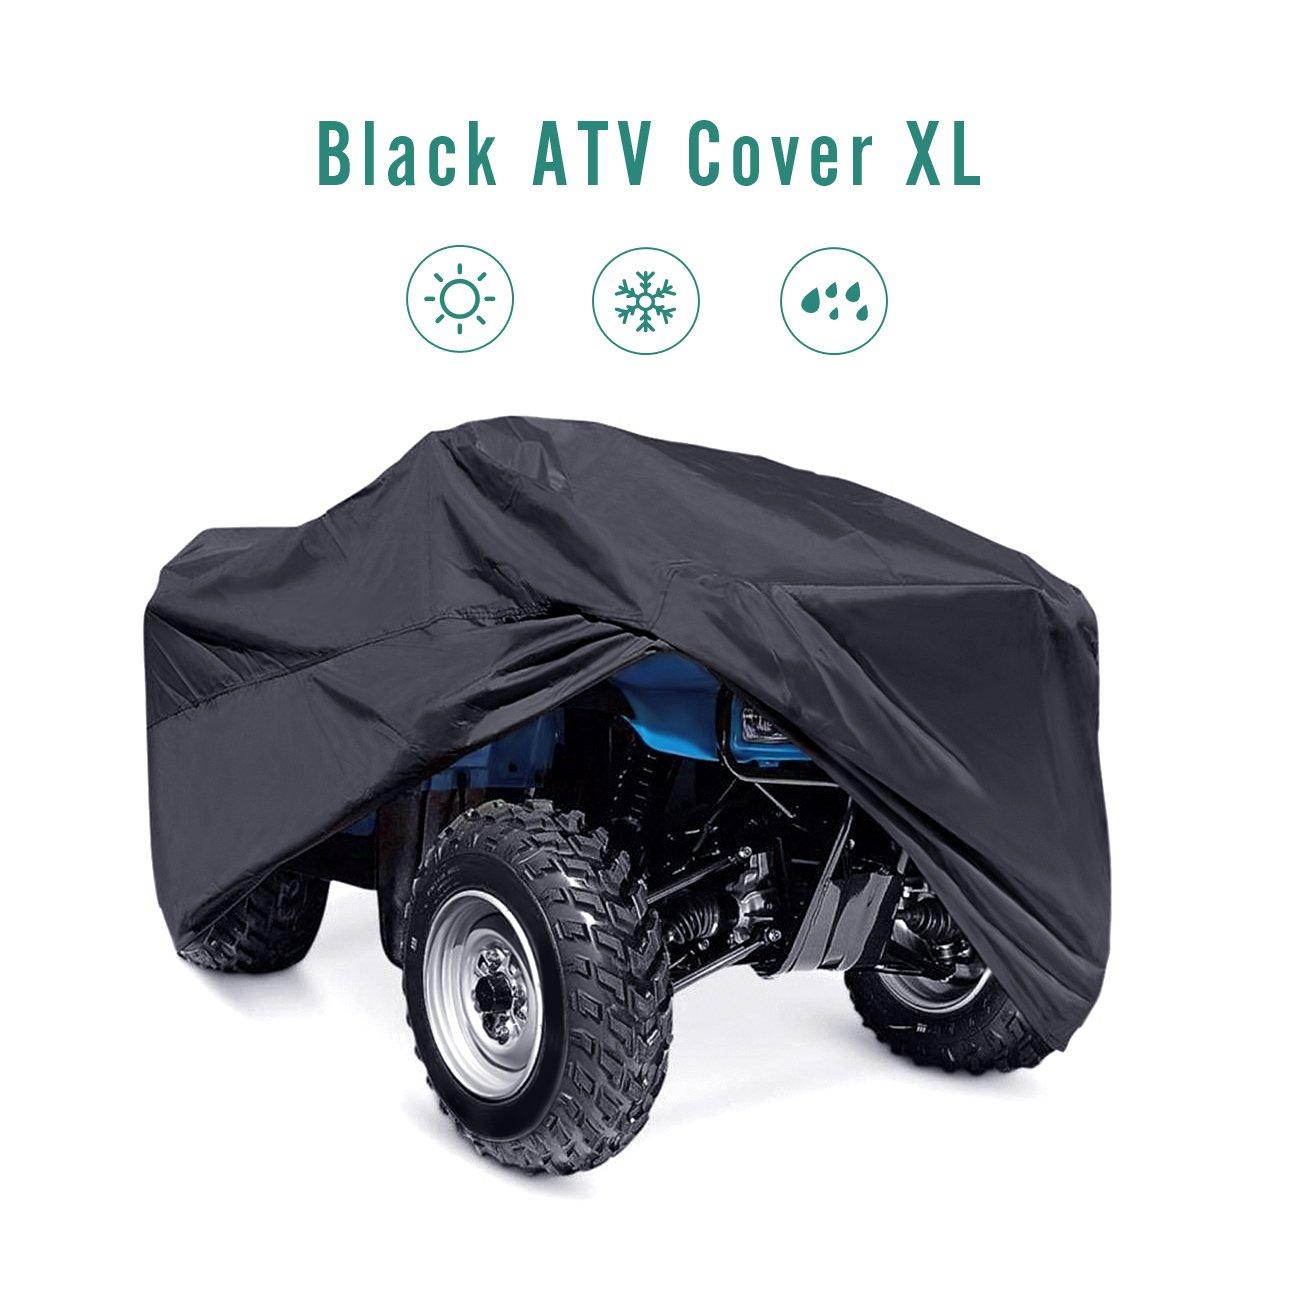 INNOGLOW 210T XL(210x120x115CM)82'' Universal Black UTV ATV Storage Cover All Season Durable Waterproof Wind-proof UV Protection for POLARIS SUZUKI YAMAHA KAWASAKI HONDA RANCHER FOREMAN FOURTRAX RECON